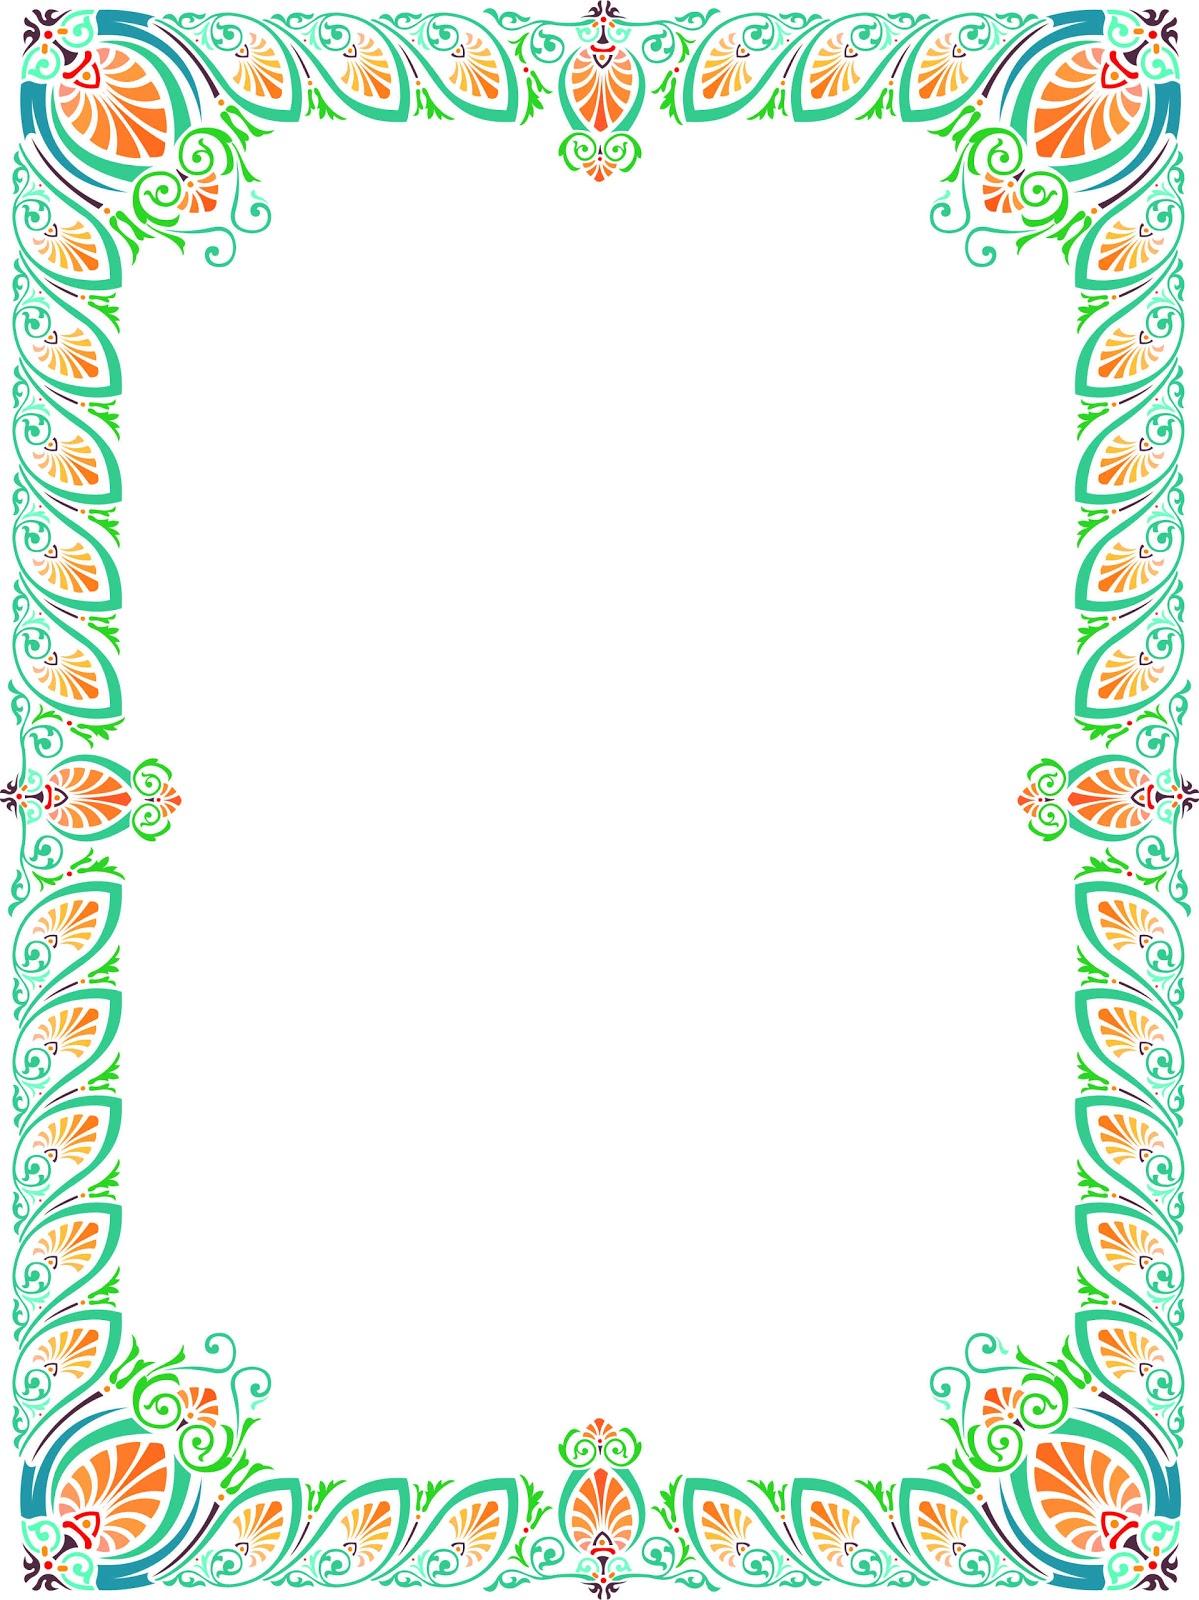 gambar bunga islam toko fd flashdisk flashdrive gambar bunga islam toko fd flashdisk